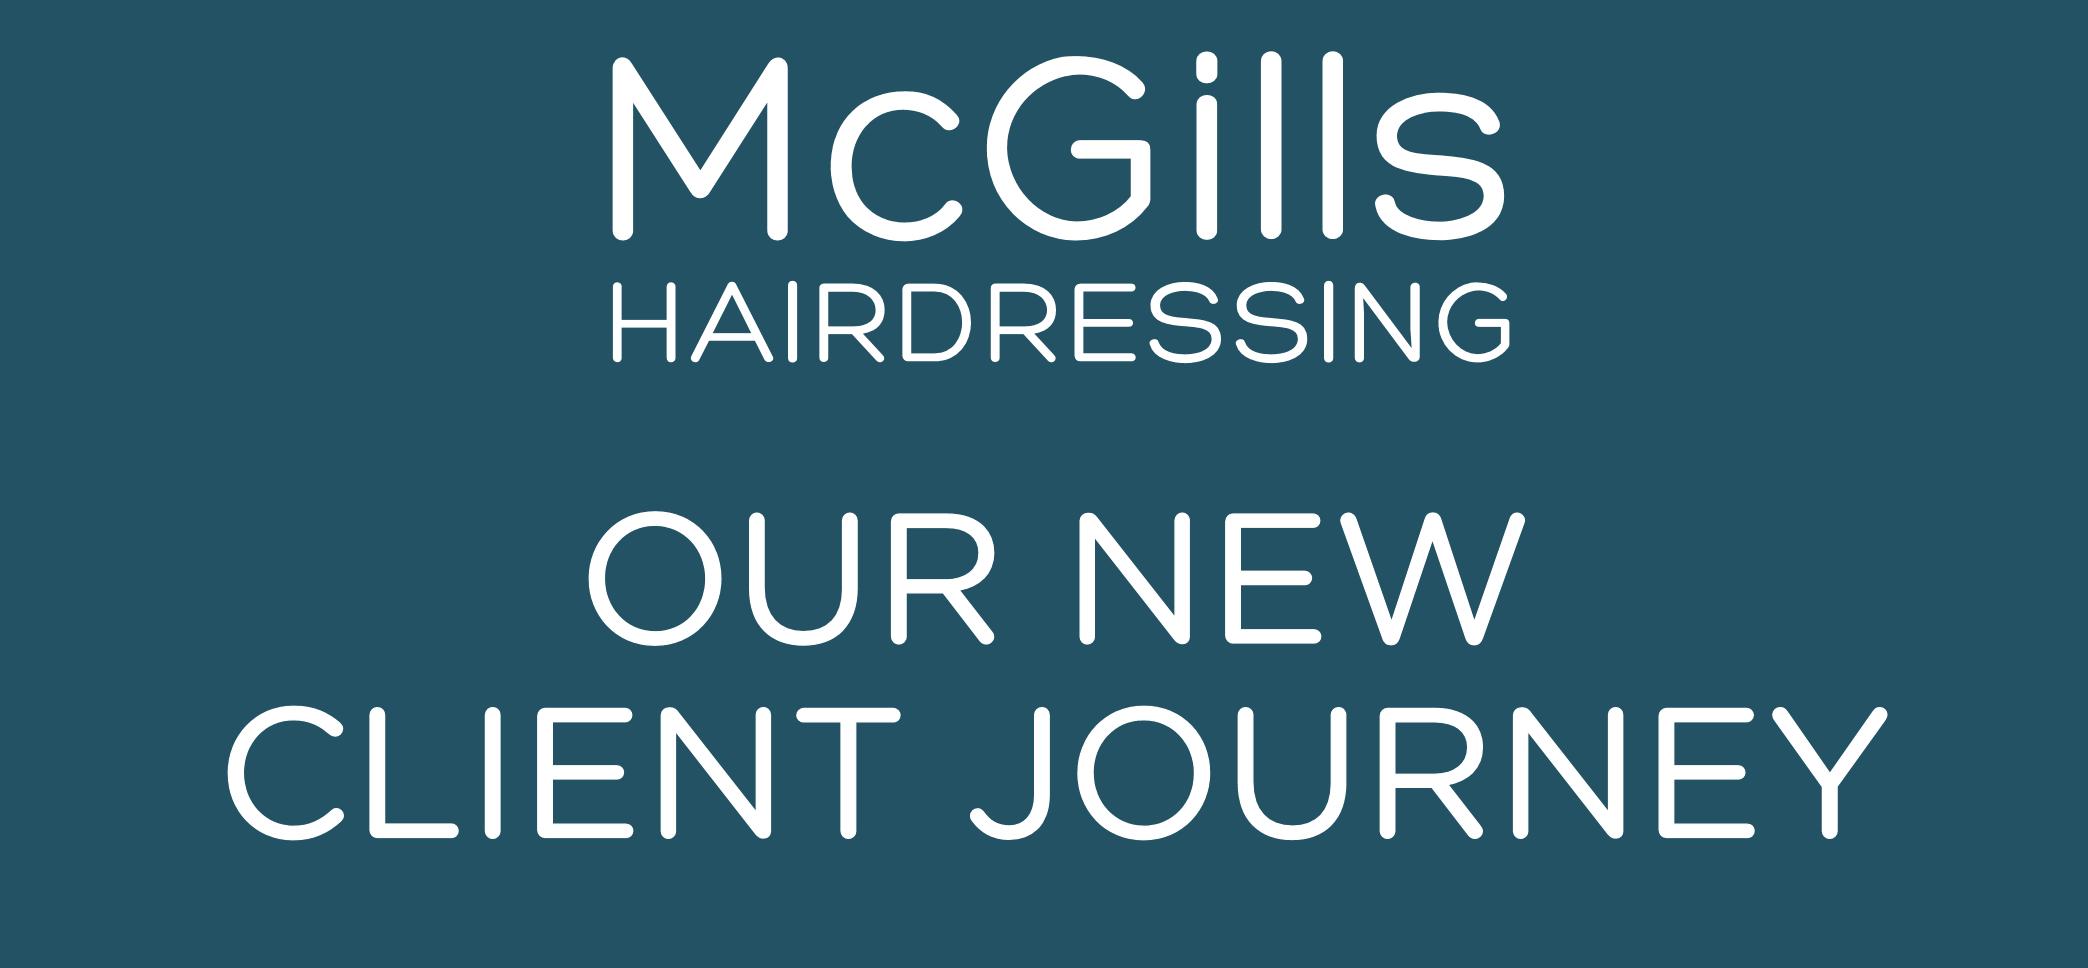 McGills Client Journey, McGills Hair Salon in Edinburgh